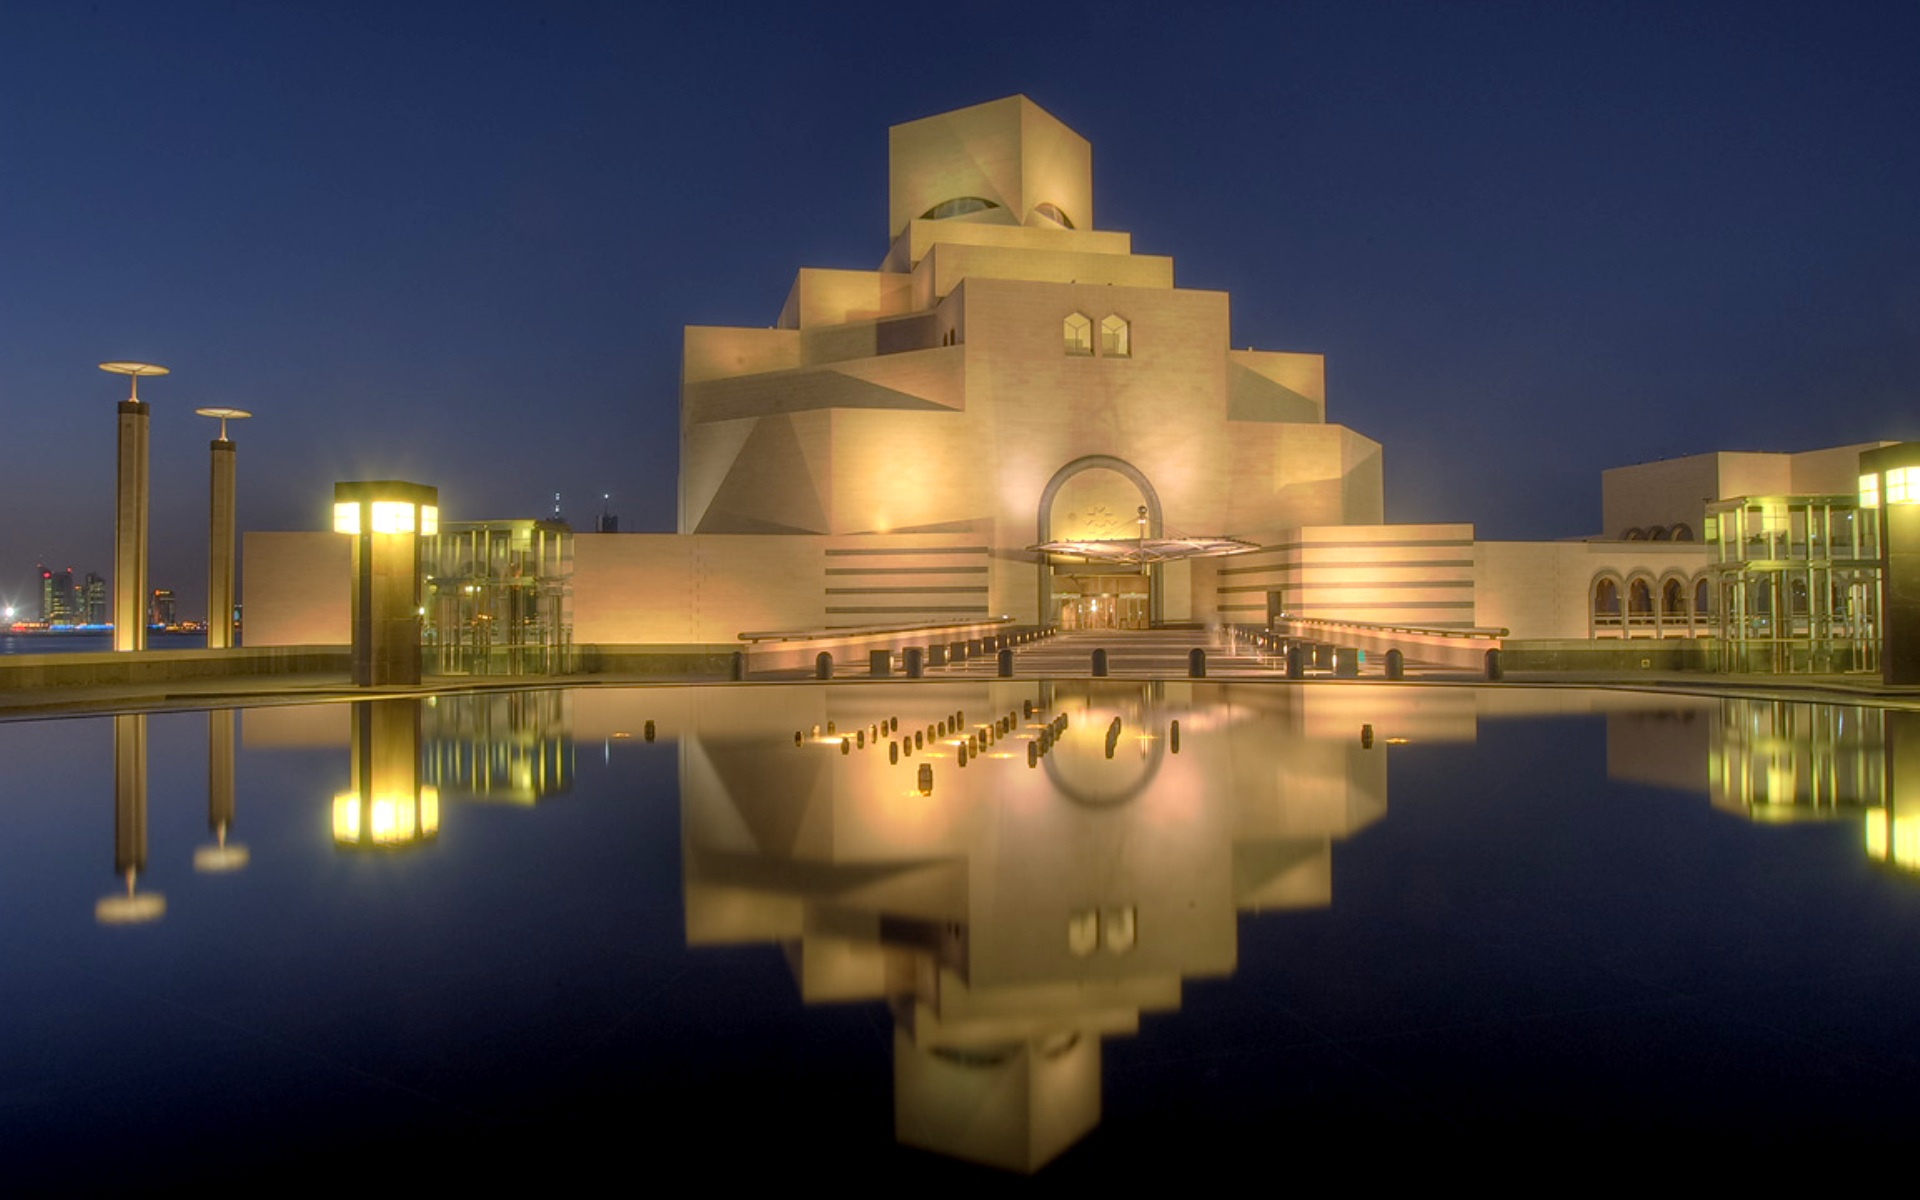 Картинка Музей исламского искусства в ...: www.kartinki24.ru/kartinki/muzei/18572.html